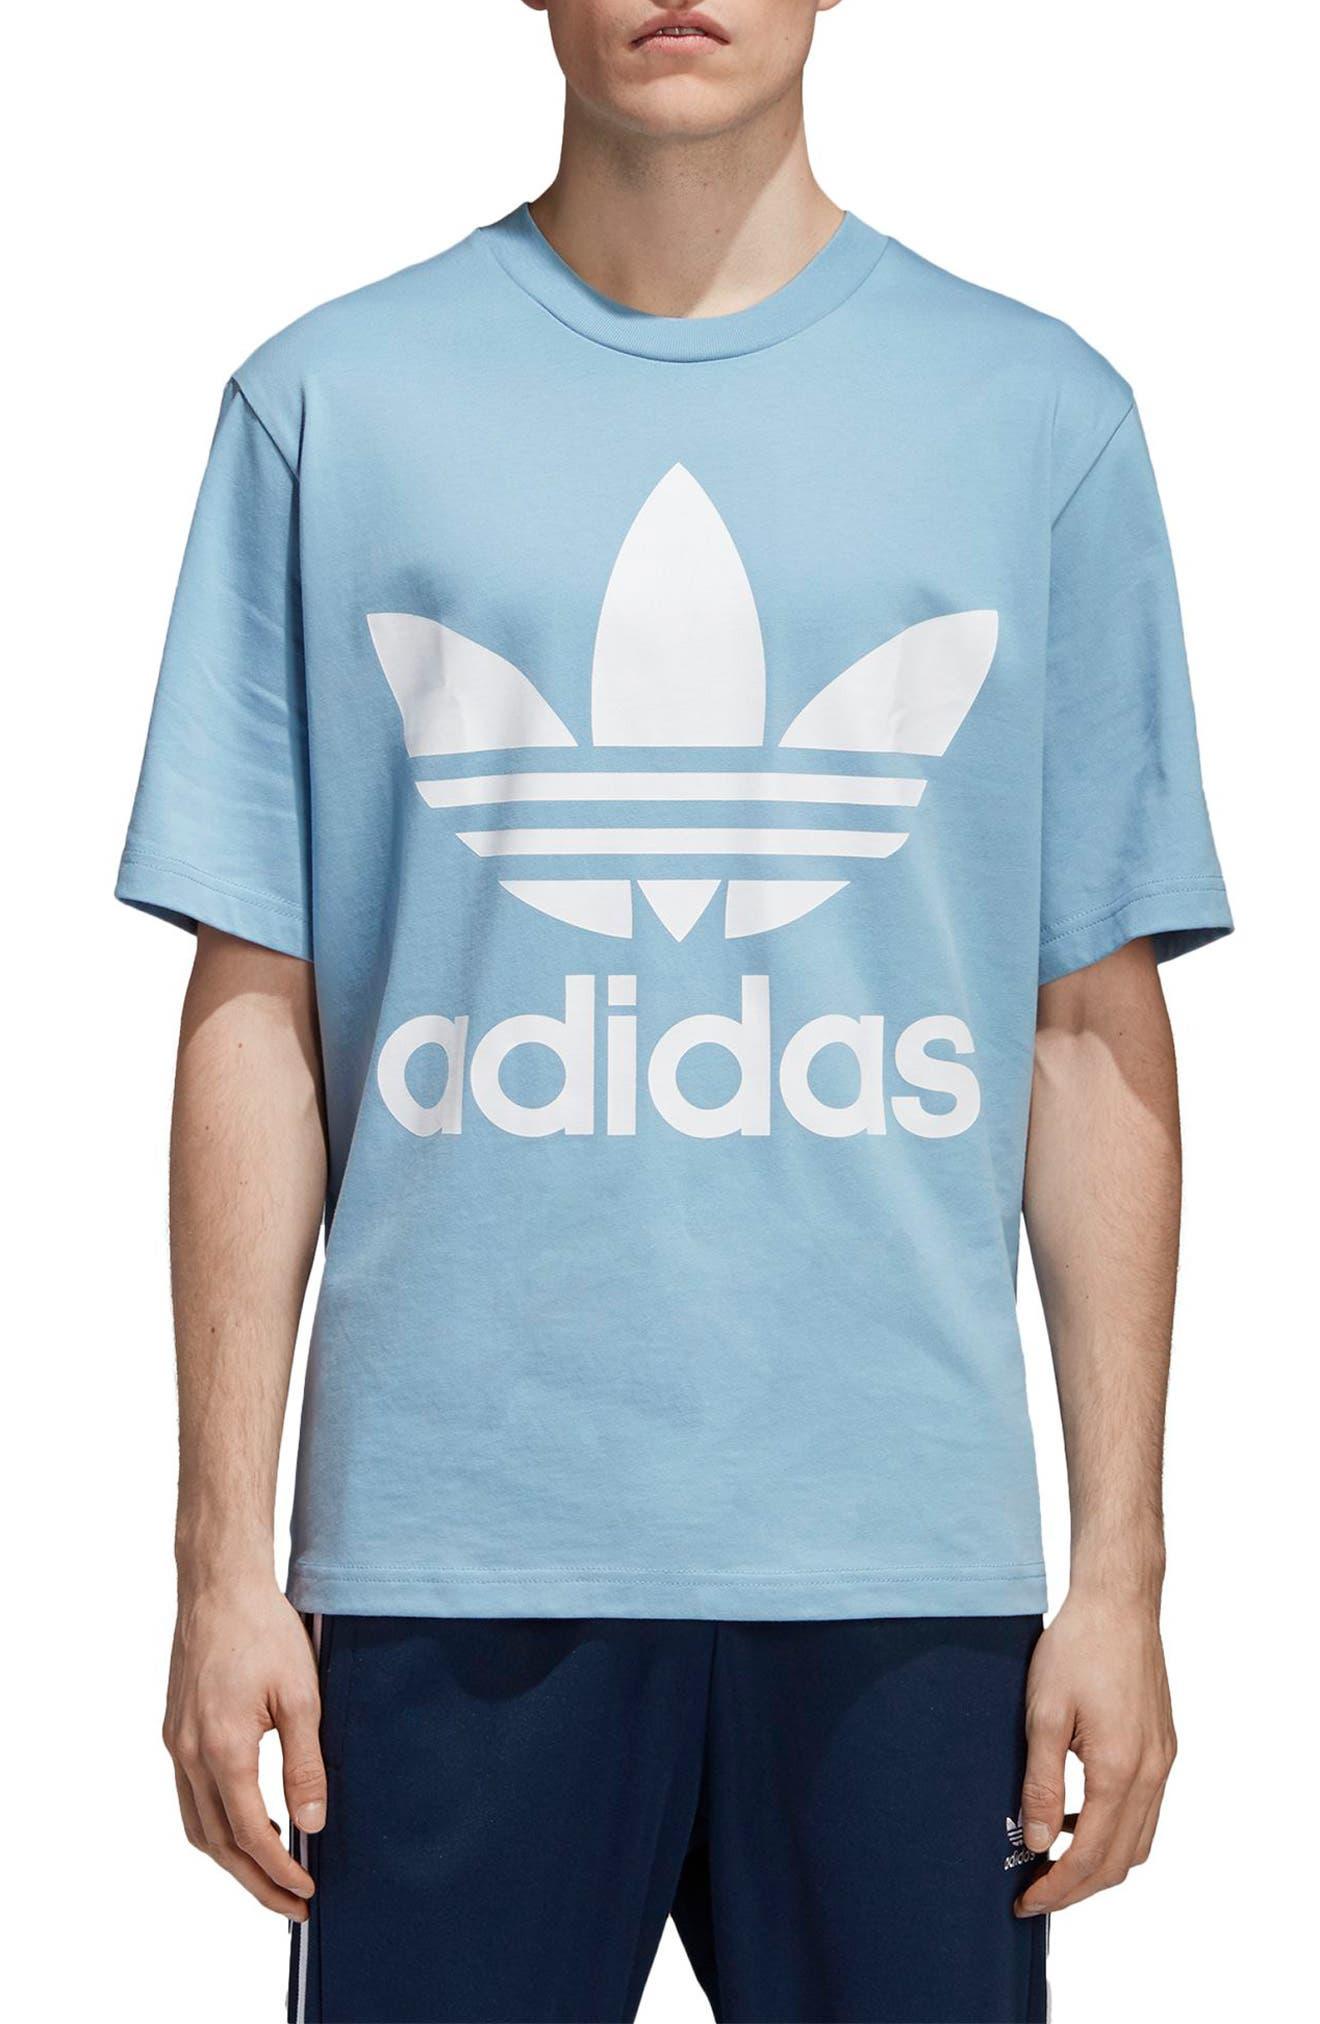 adidas Originals Oversized Trefoil Logo T-Shirt